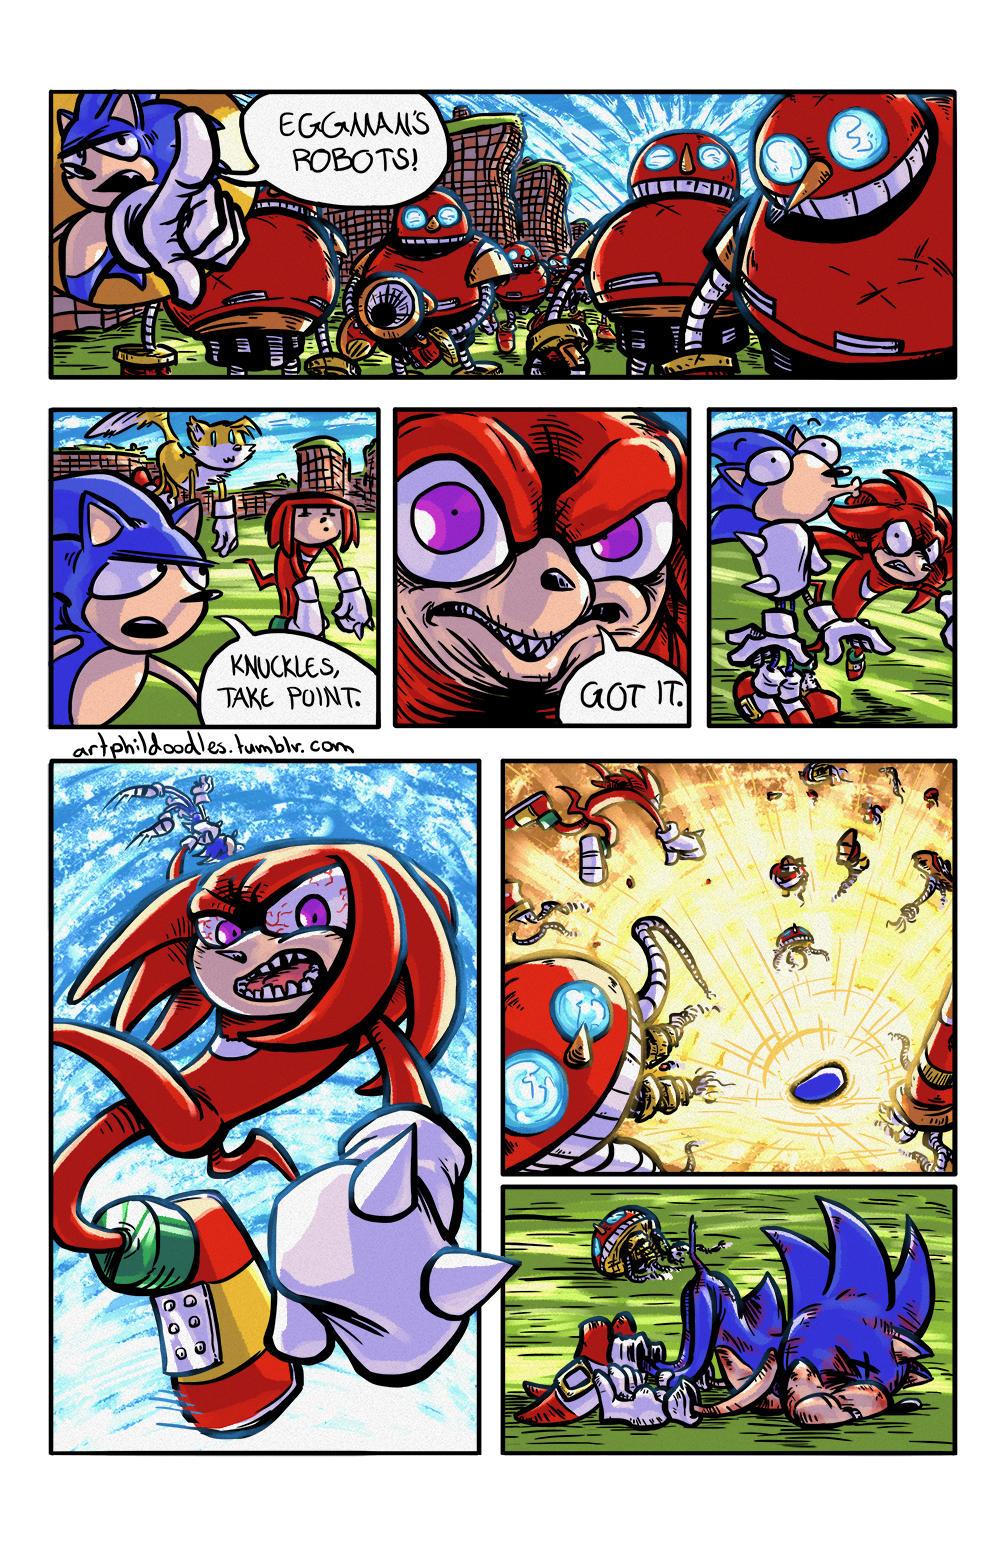 sonic hedgehog heroes logic meme shift rock comments know